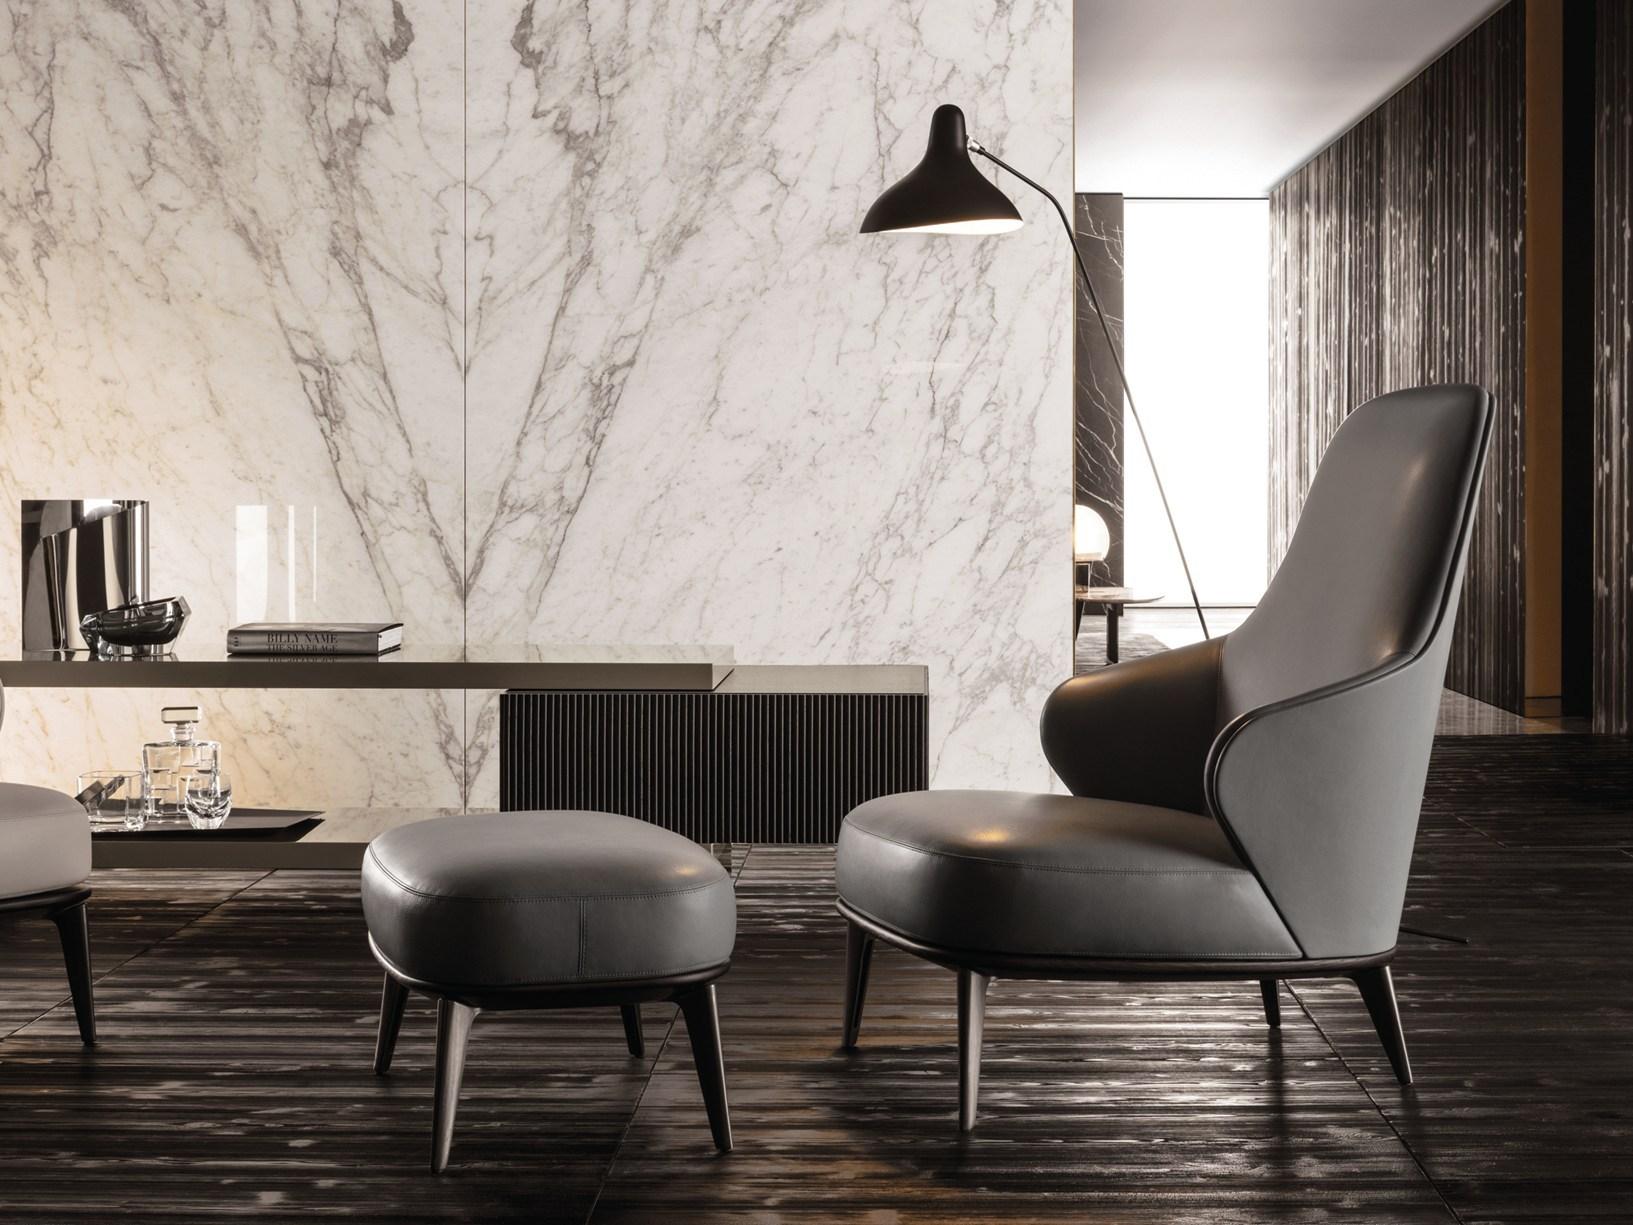 Leslie Armchair & Footstool by Minotti